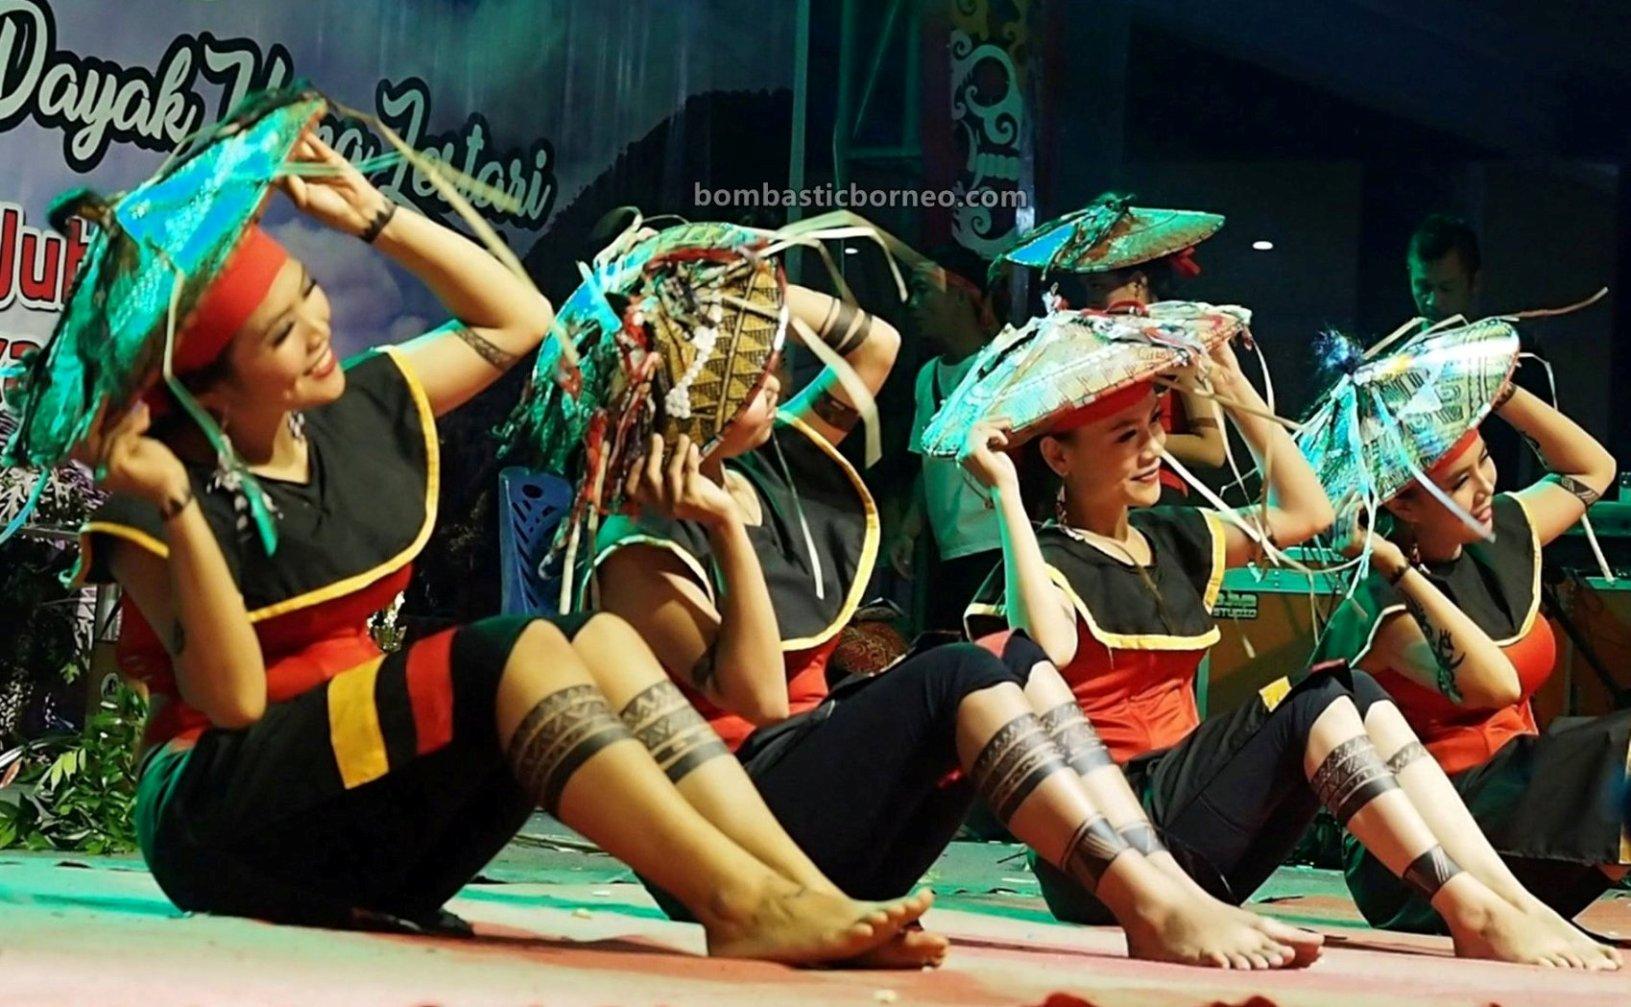 rice harvest festival, traditional, indigenous, Borneo, West Kalimantan, ethnic, native, tribal, tribe, Obyek wisata, Tourism, travel guide, cross border, 新党土著传统文化, 印尼西加里曼丹